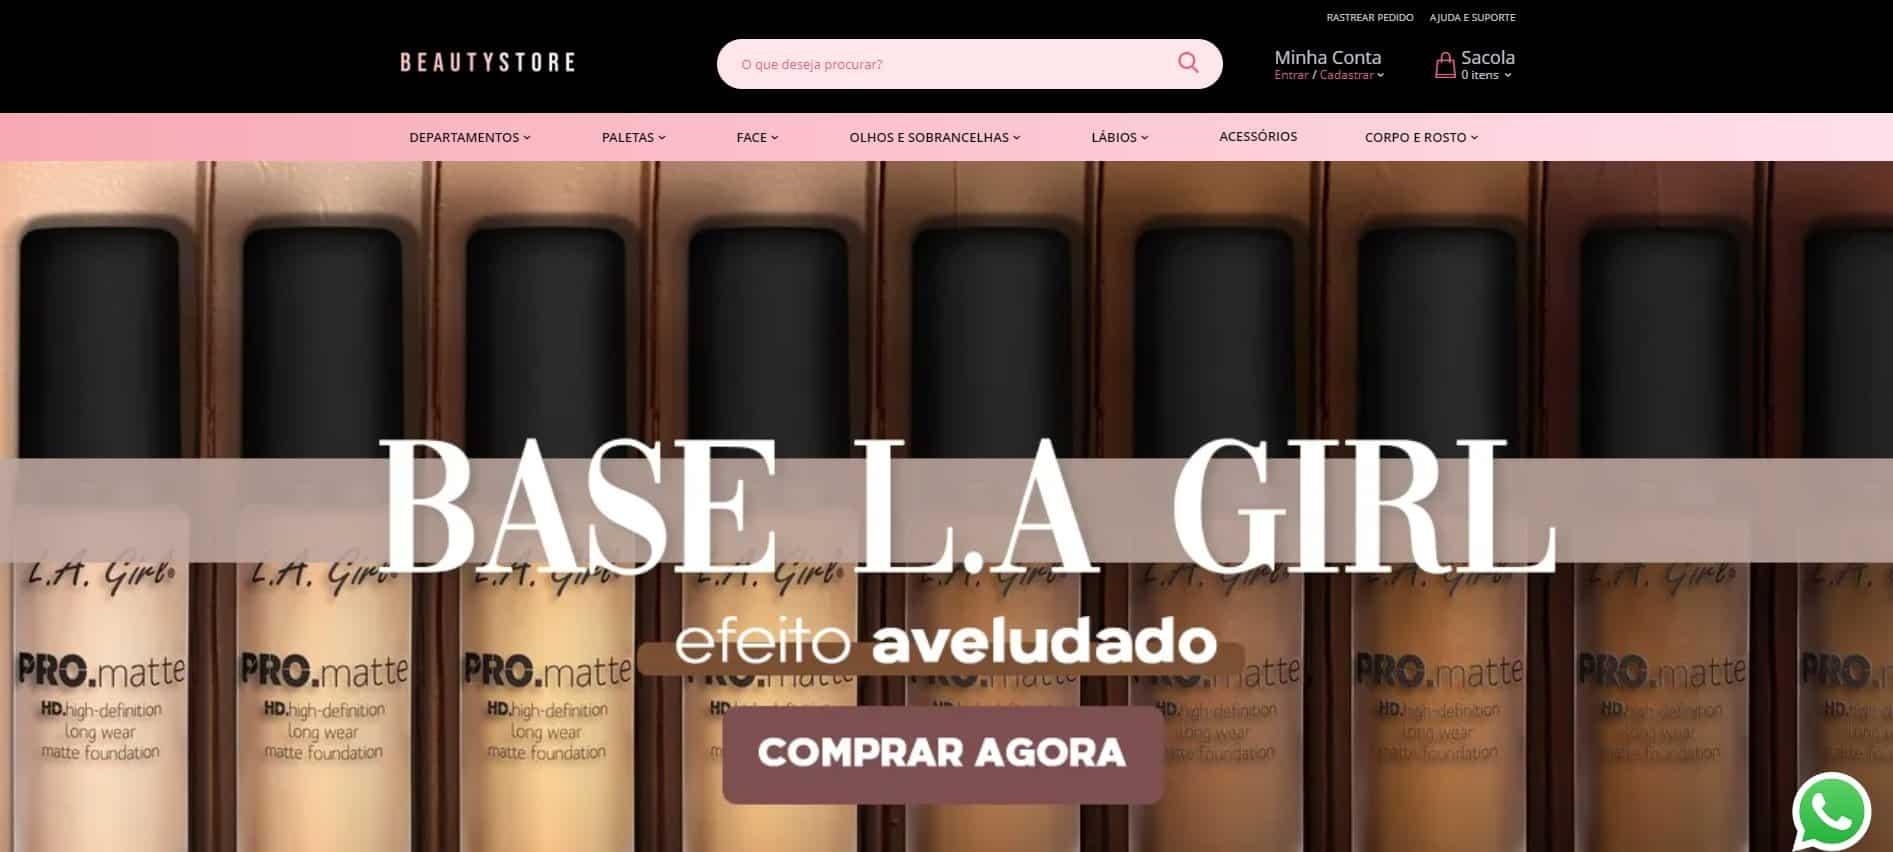 Beauty Store MS